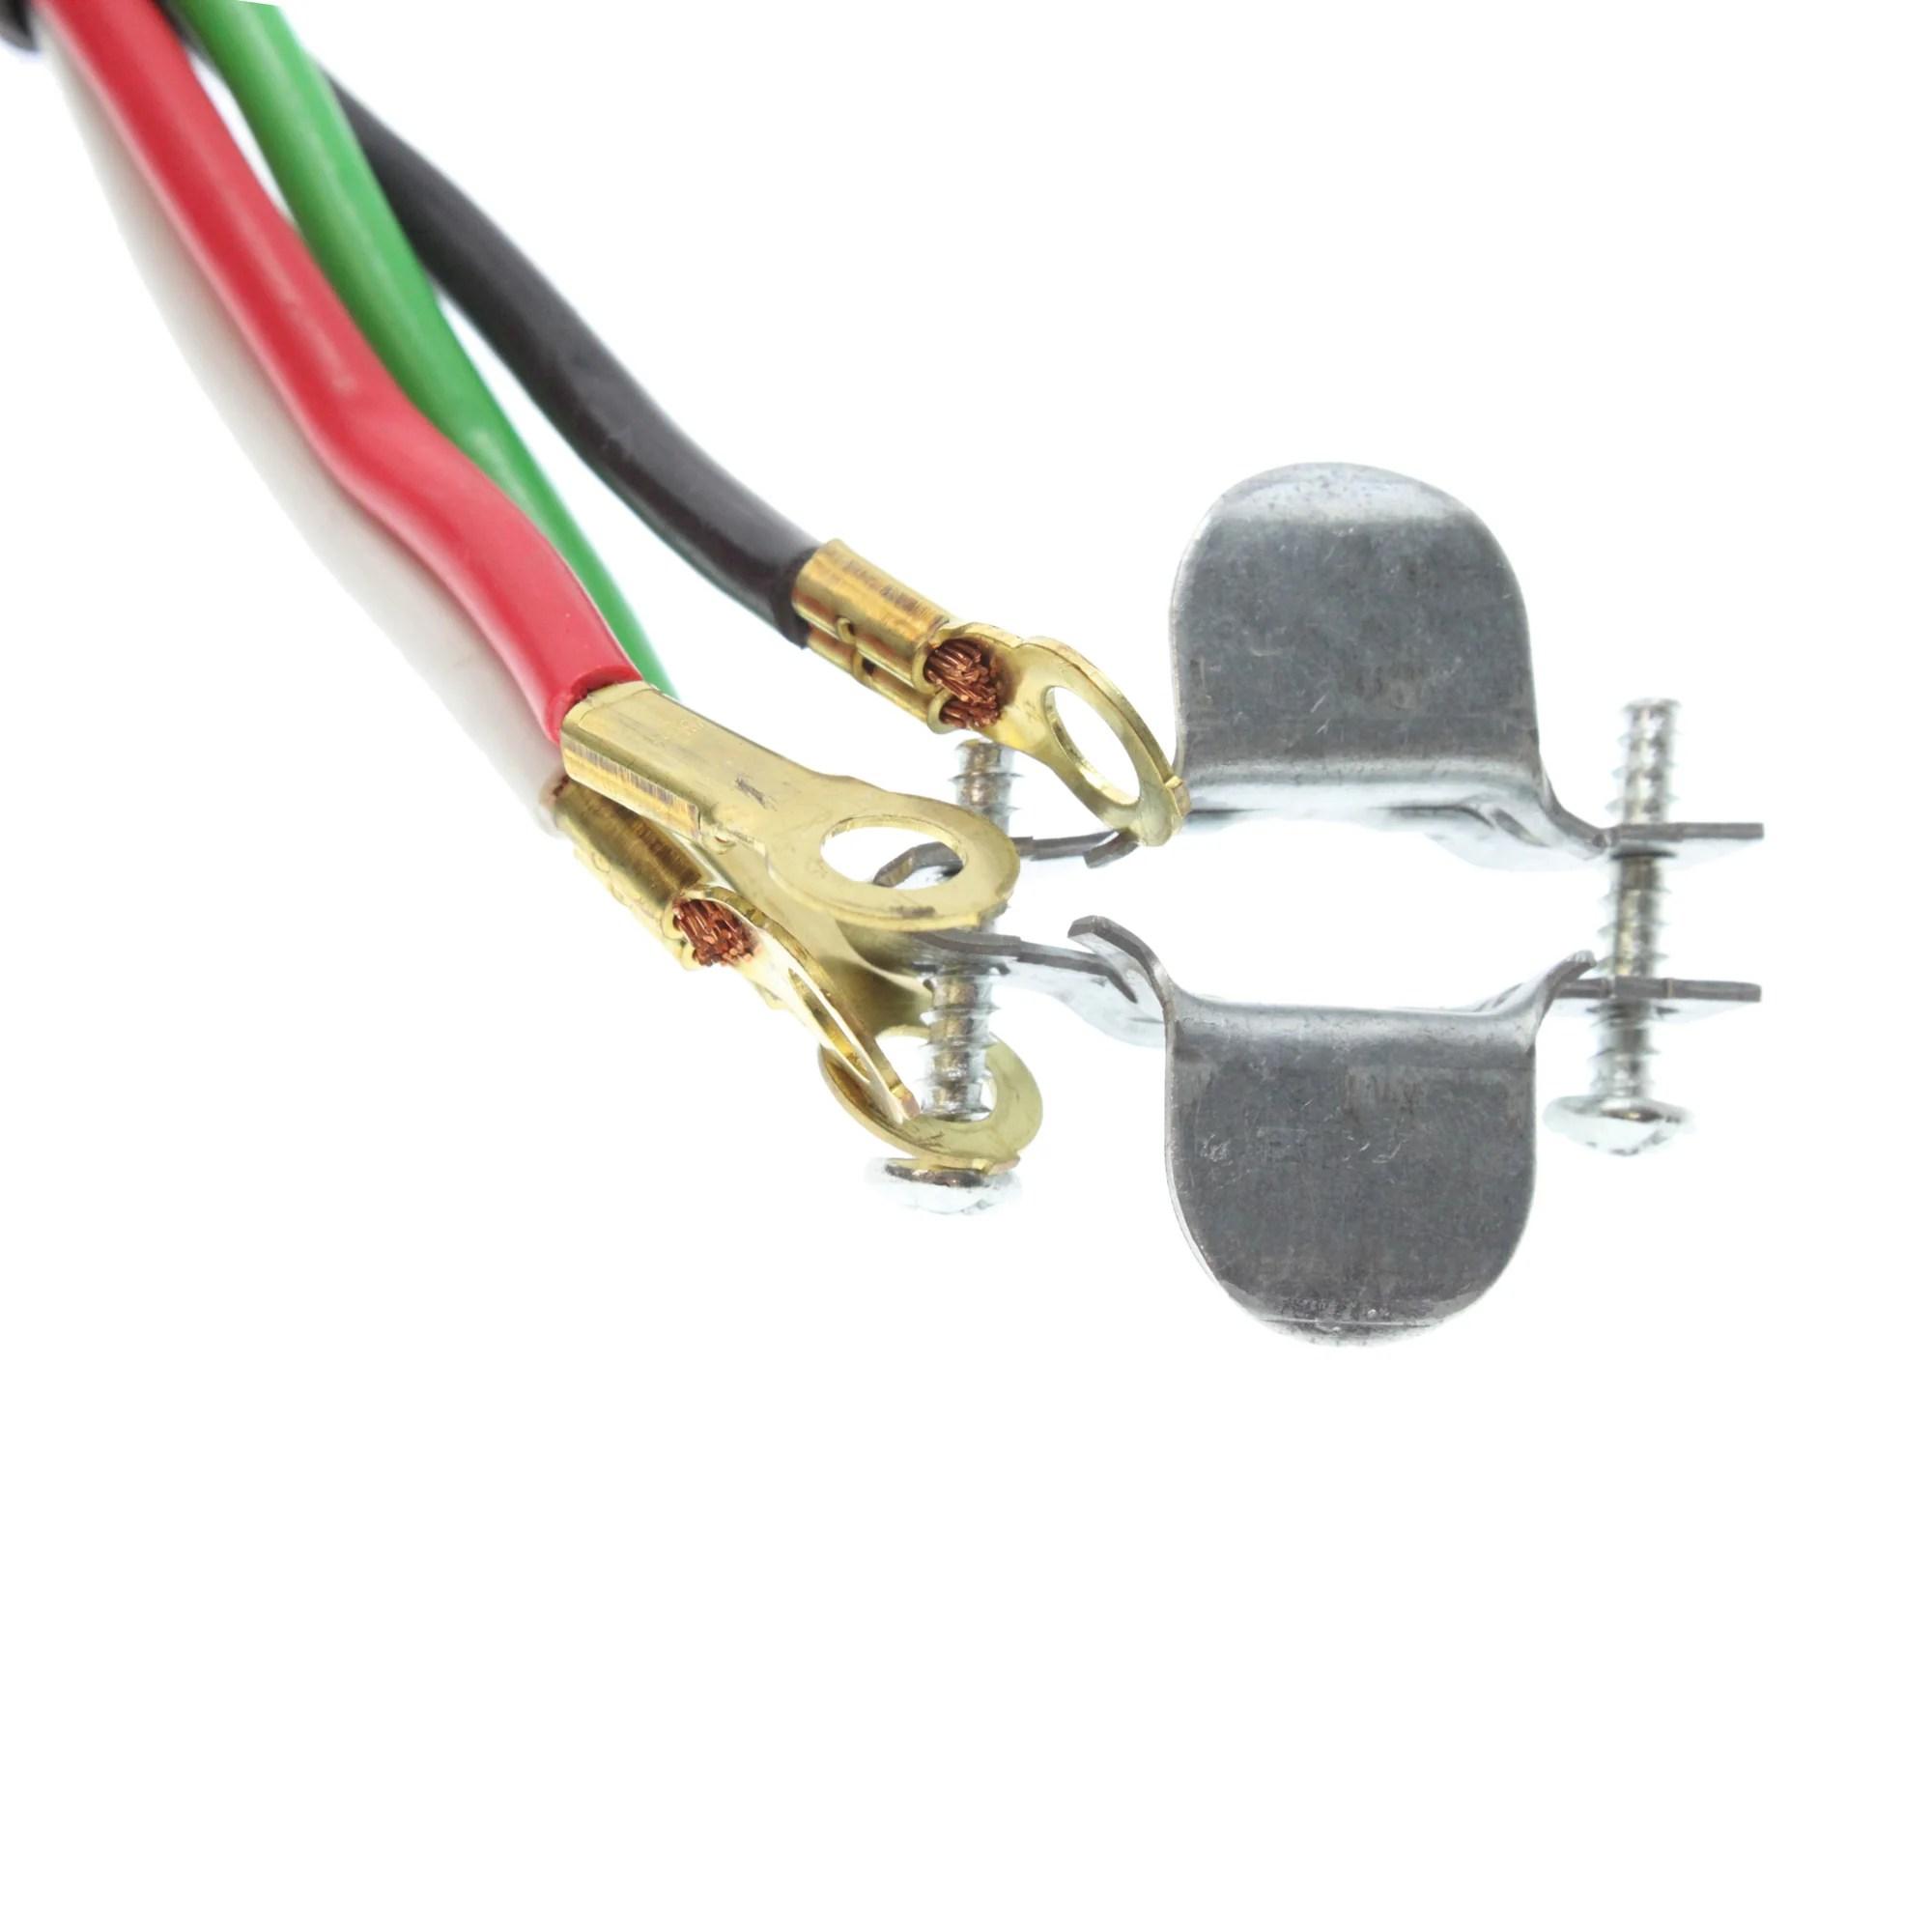 american insulated wire a5434006bl dryer cord w plug 30a nema 14 30p 6 feet [ 2000 x 2000 Pixel ]